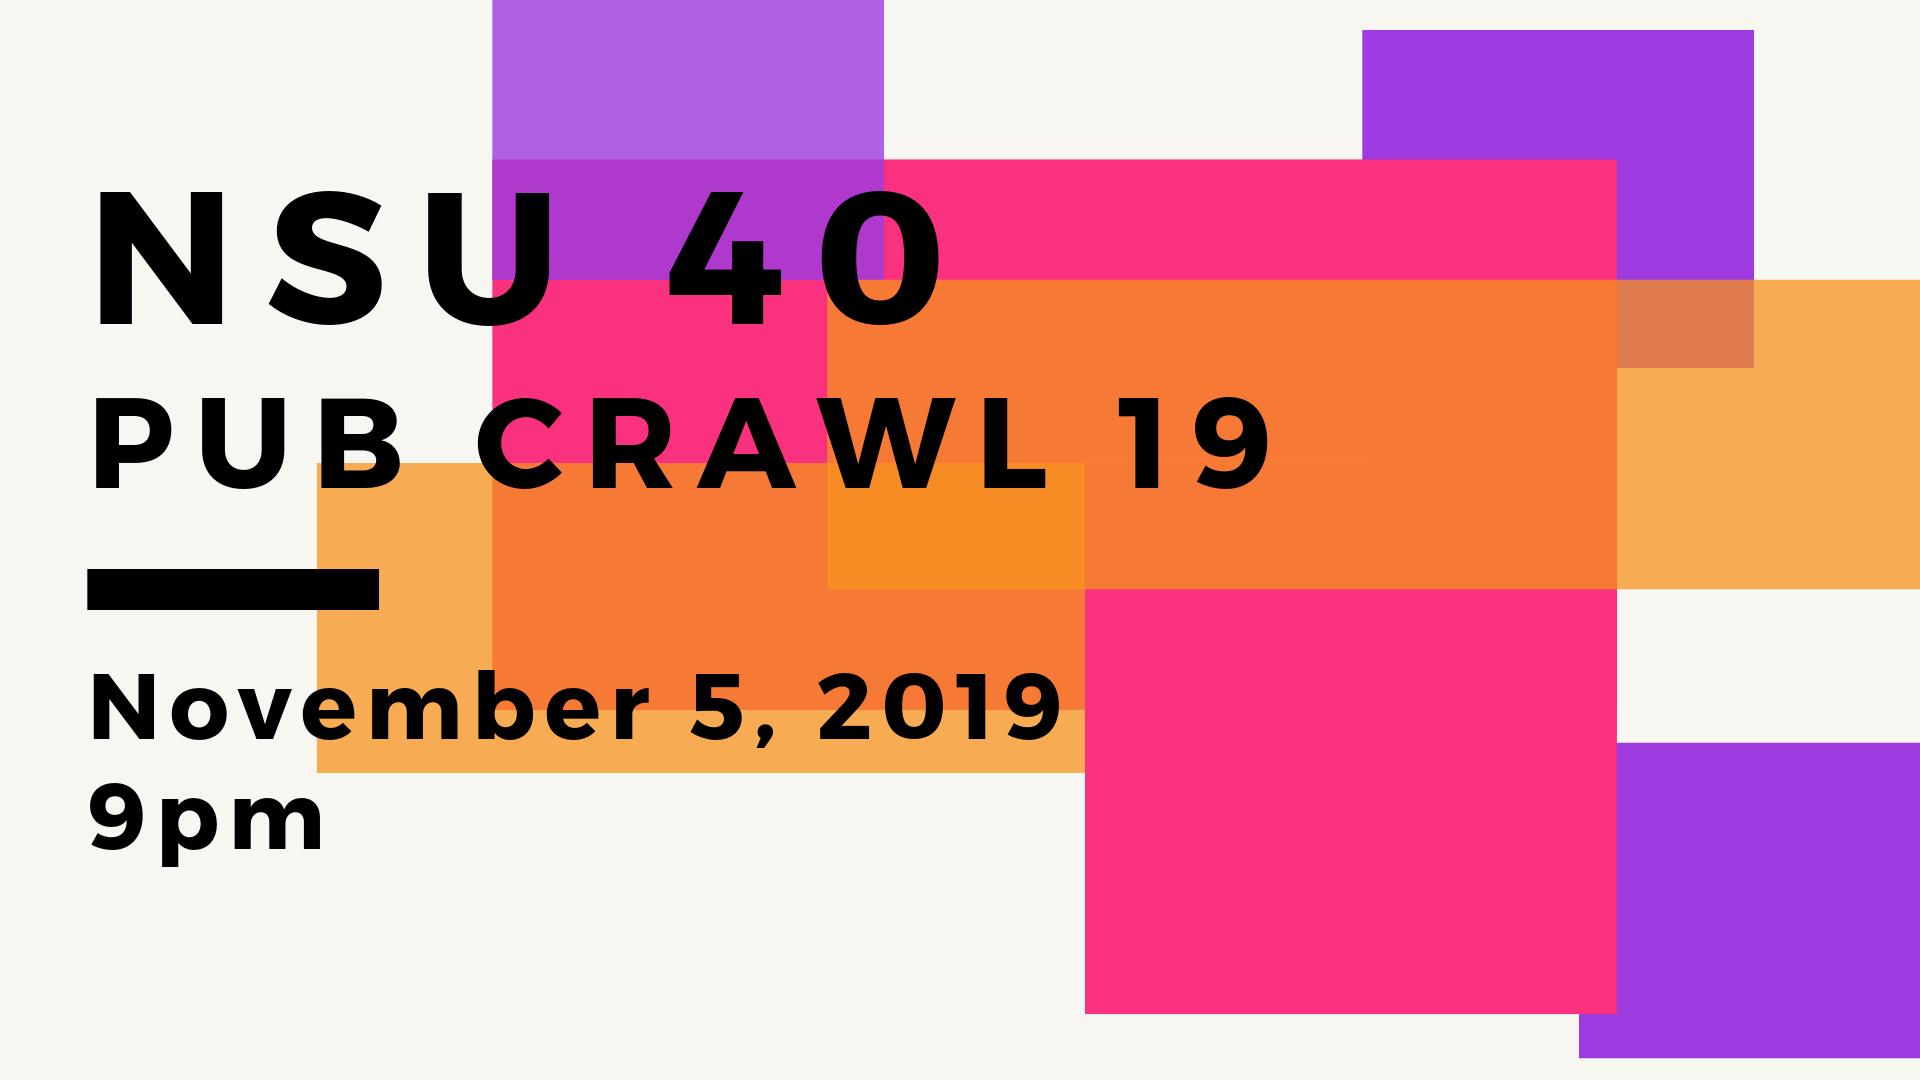 NSU 40 PUB CRAWL 19.png